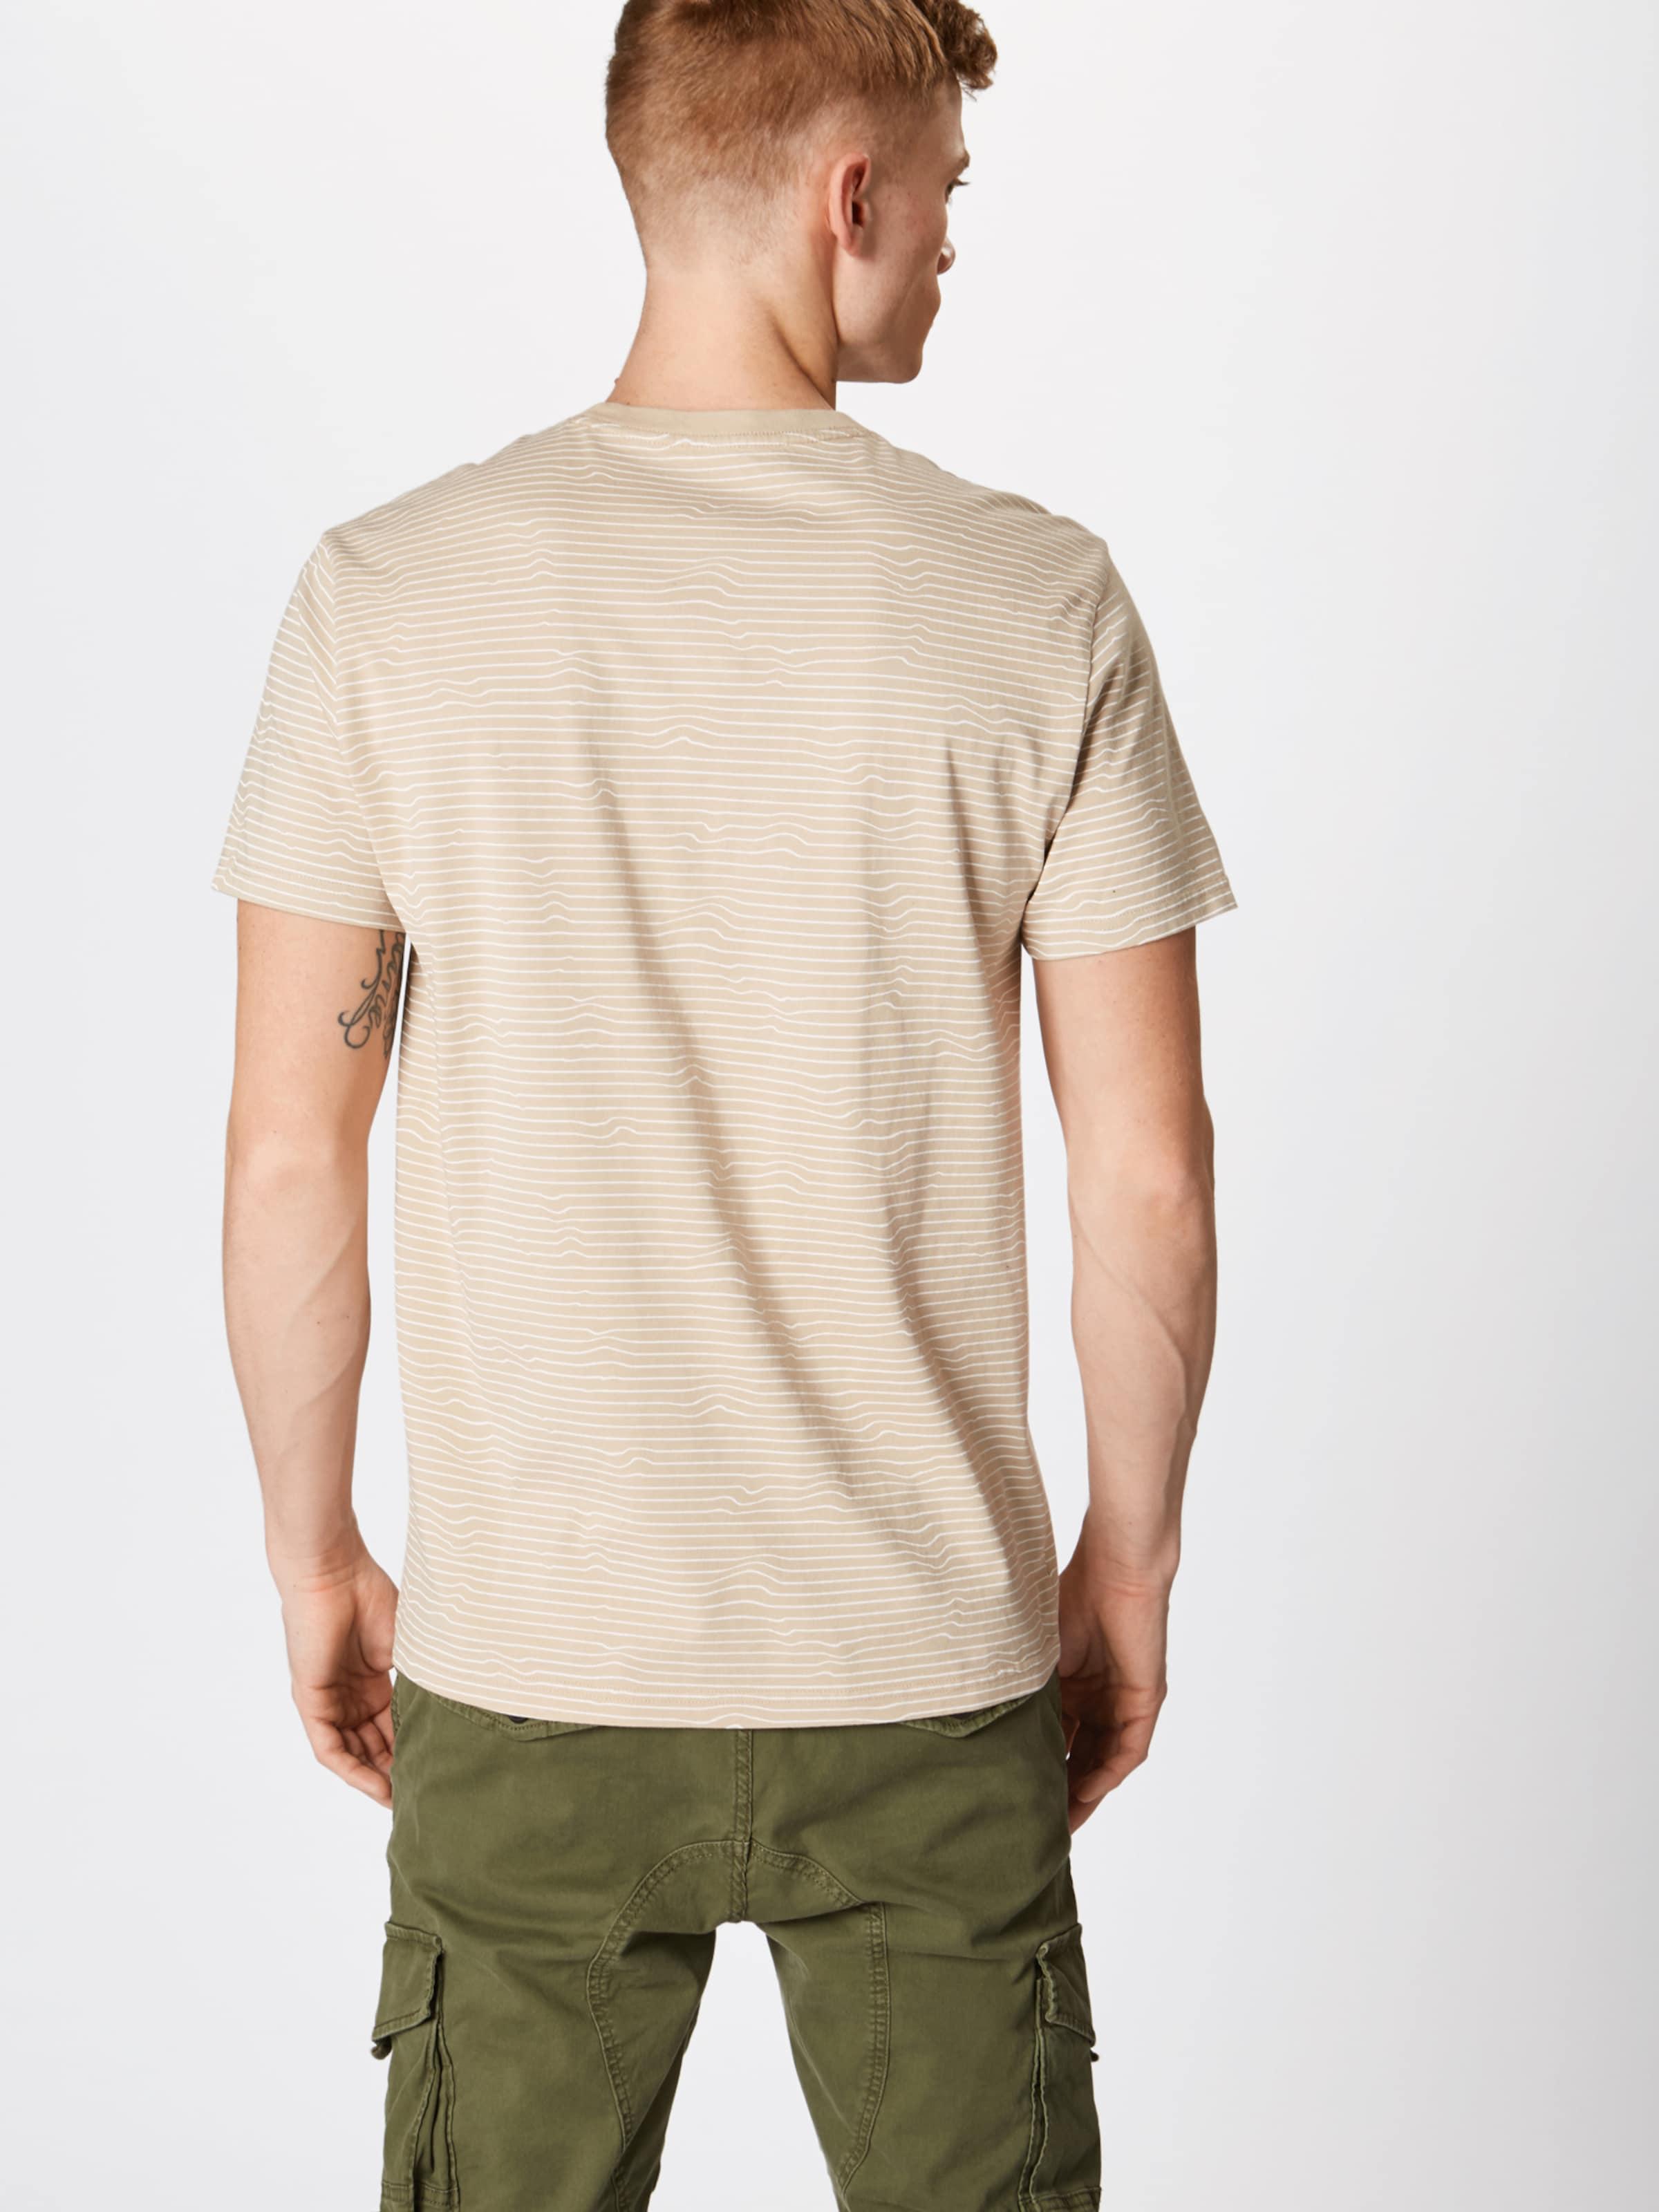 T shirt Blanc Aop' Review Bump 'cn Cassé En PXO8n0wk